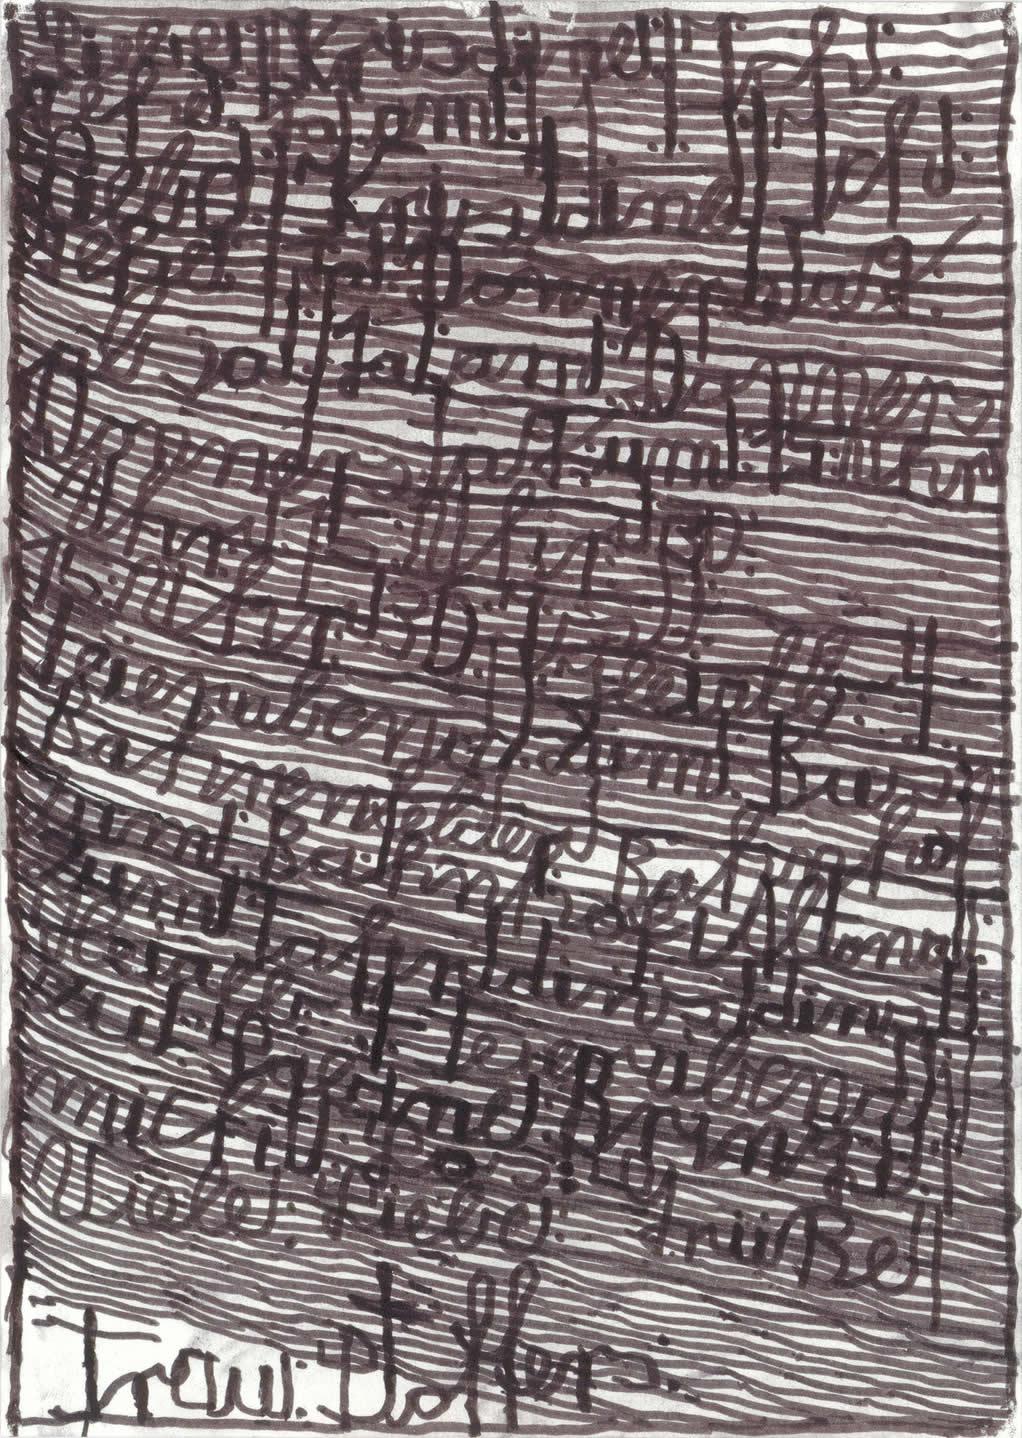 Harald Stoffers | Brief281 2014 | 29,5x21cm | viennacontemporary | Galerie3